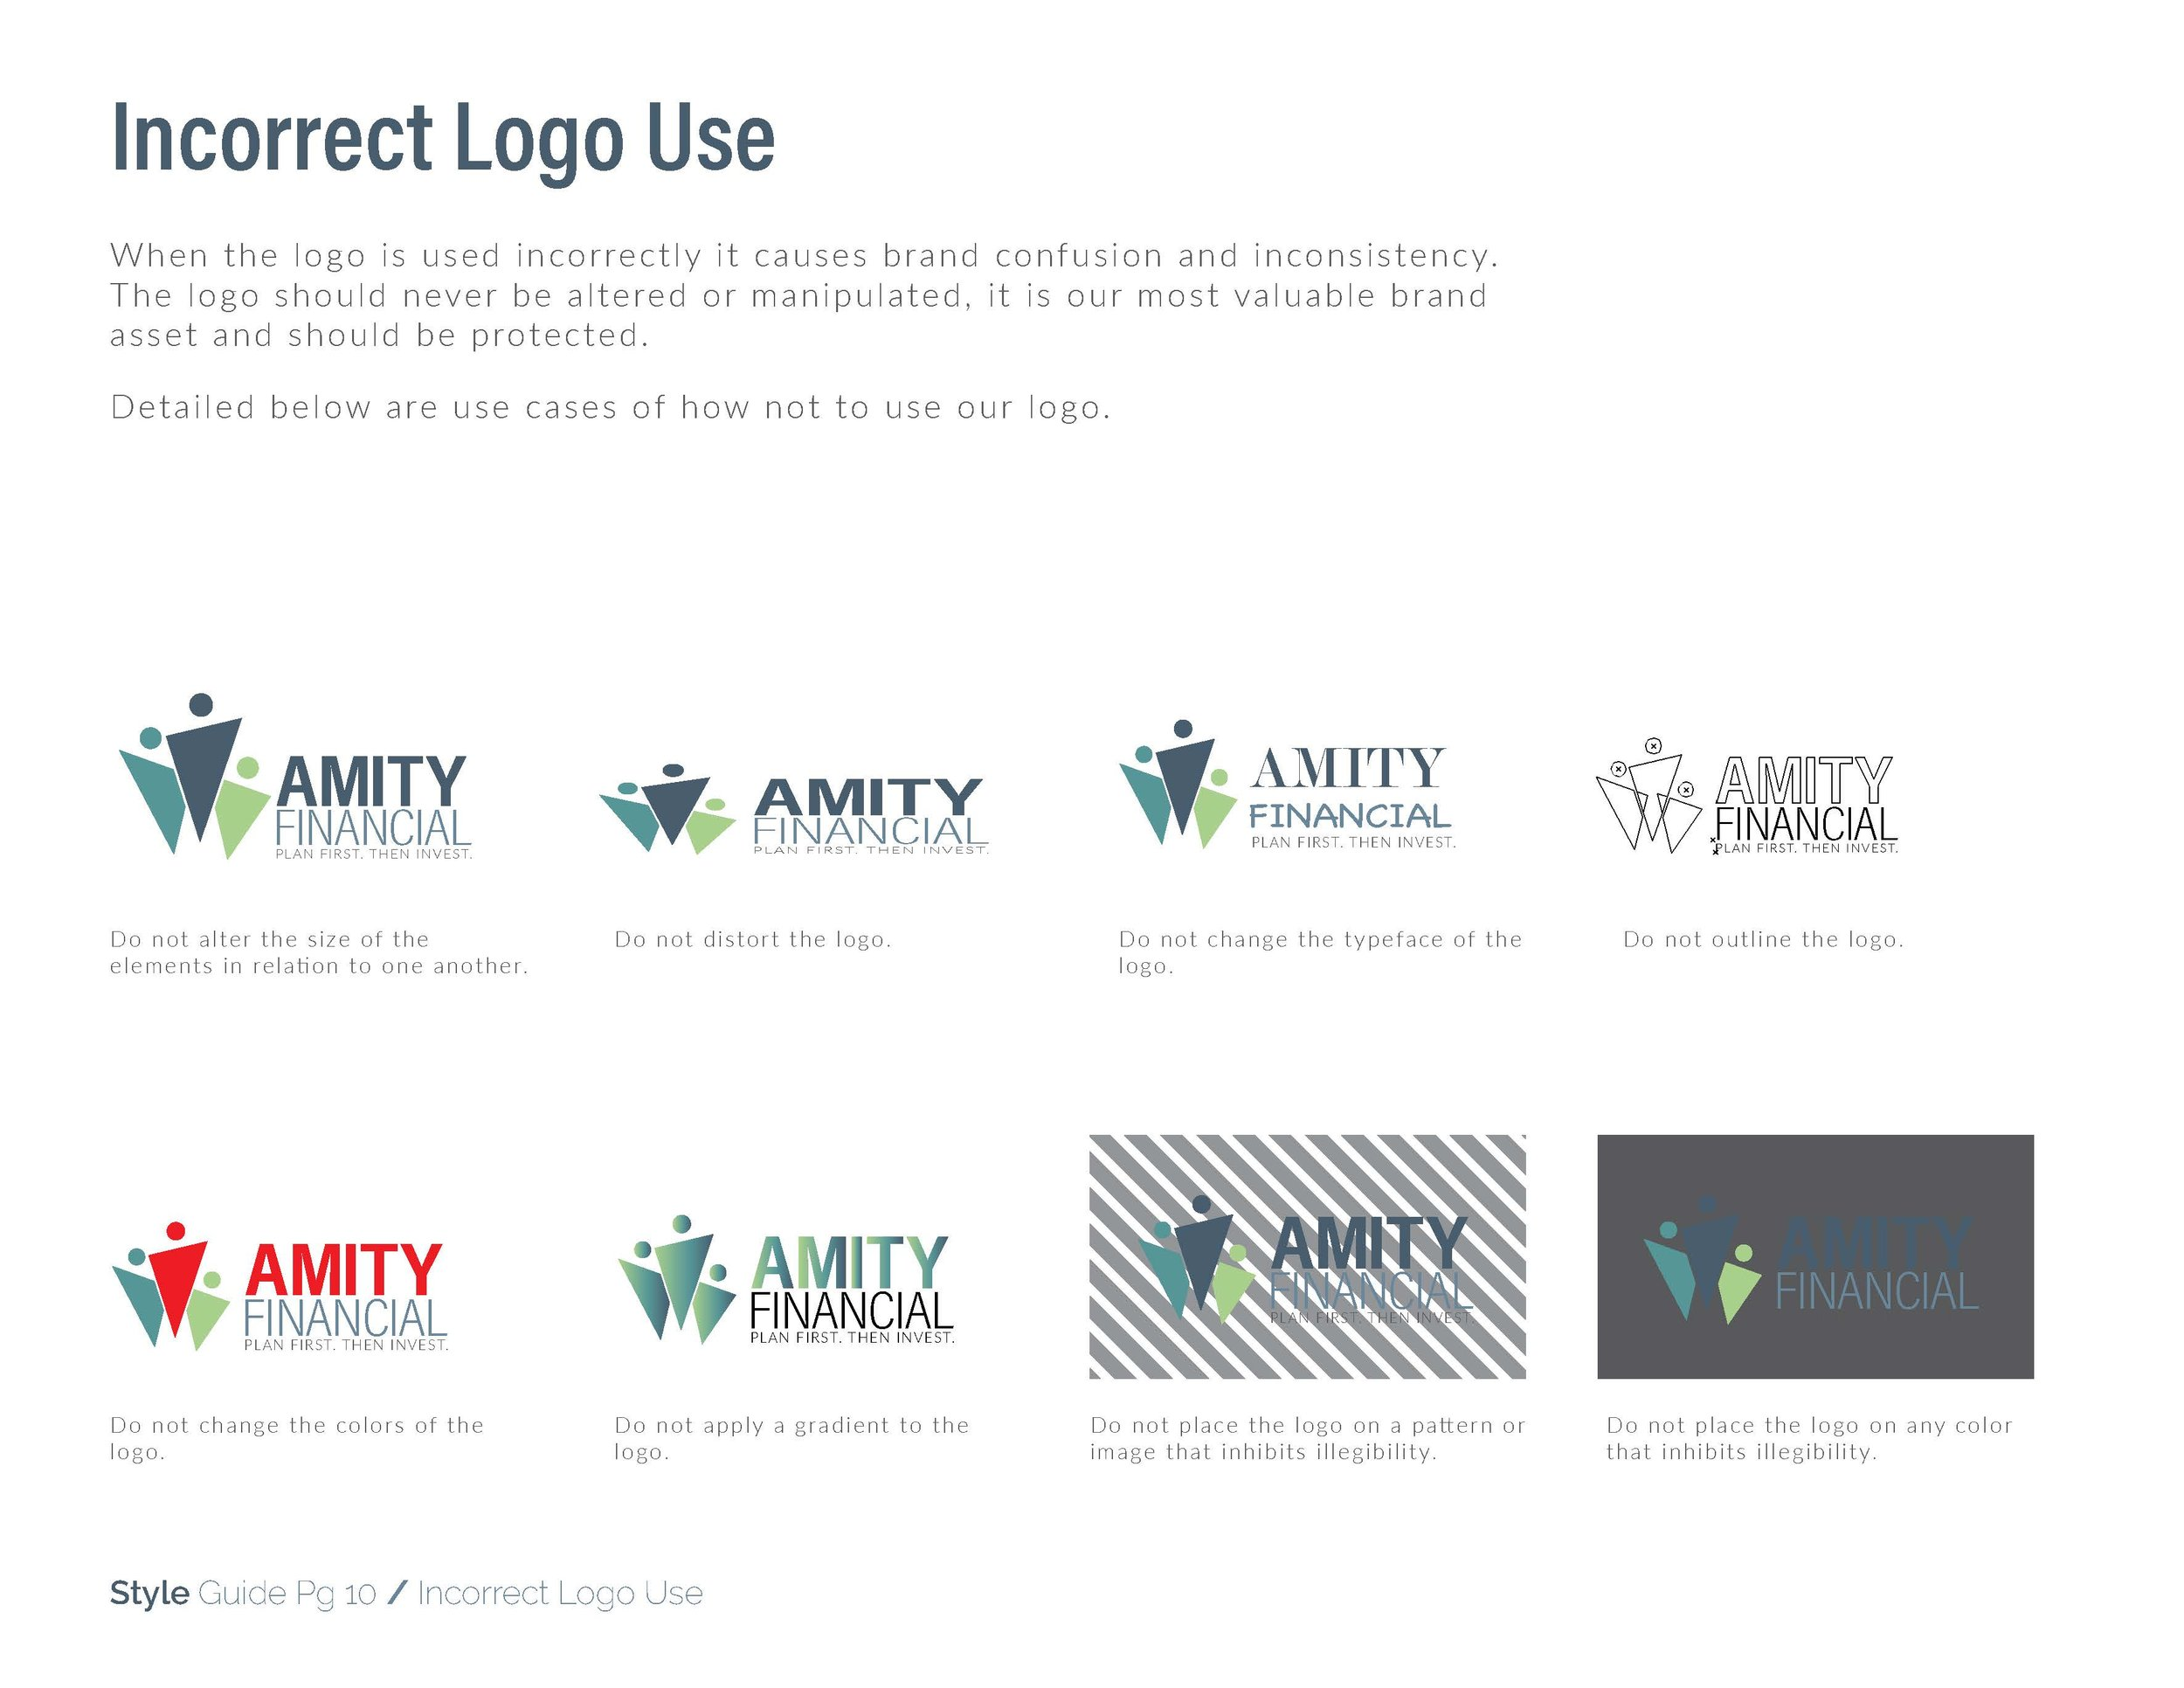 Amity-StyleGuide FINAL_Page_11.jpg